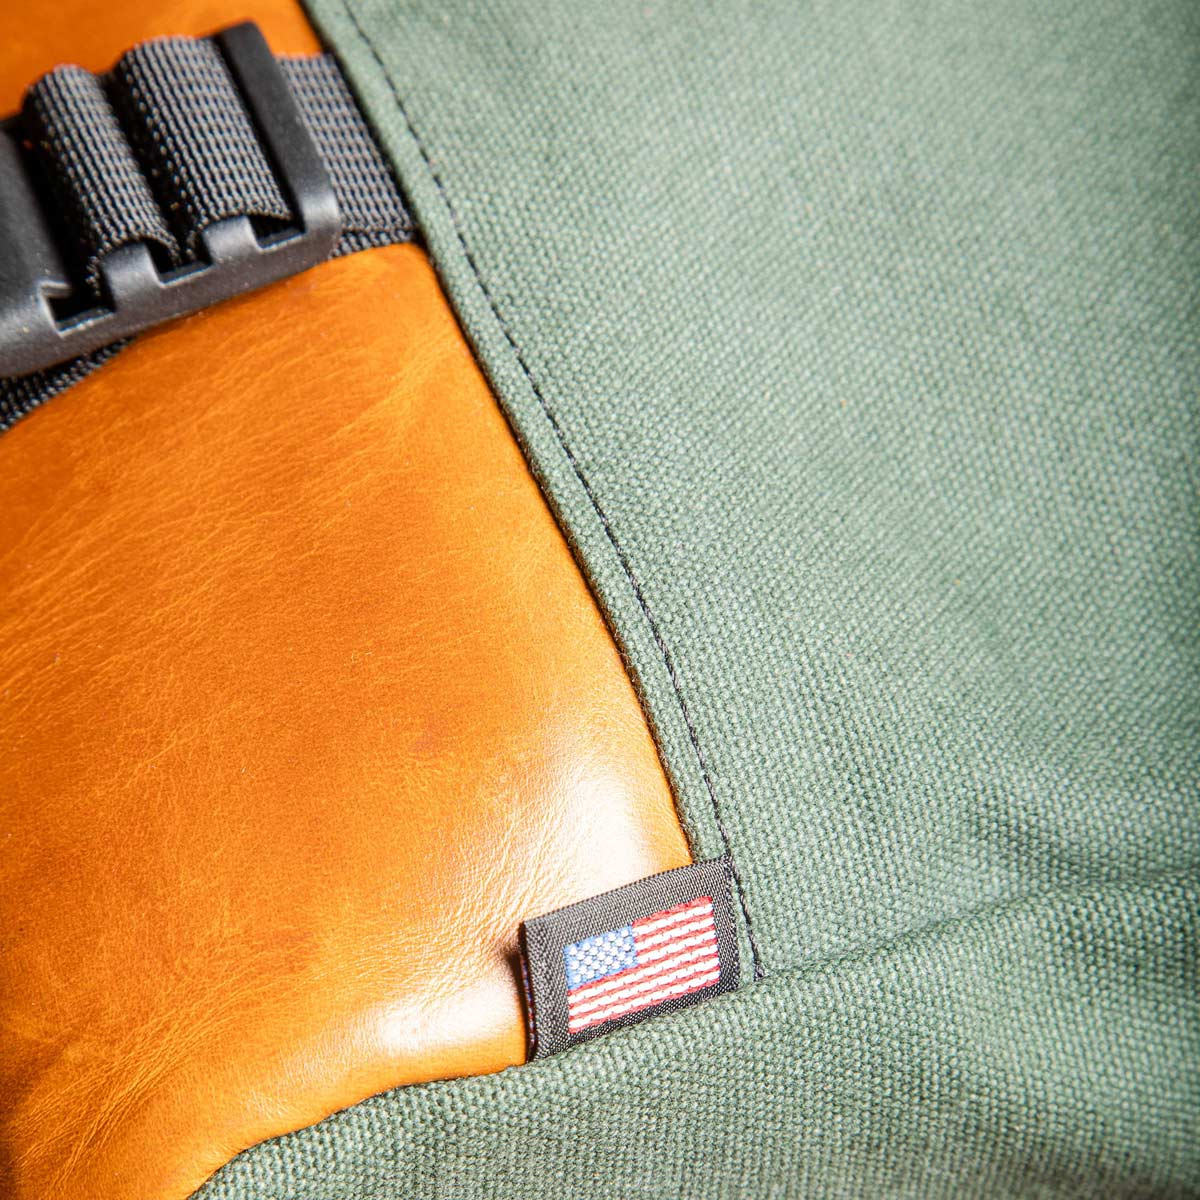 Topo Designs Commuter Briefcase Heritage Olive Canvas/Brown Leather, shoulder bag and backpack